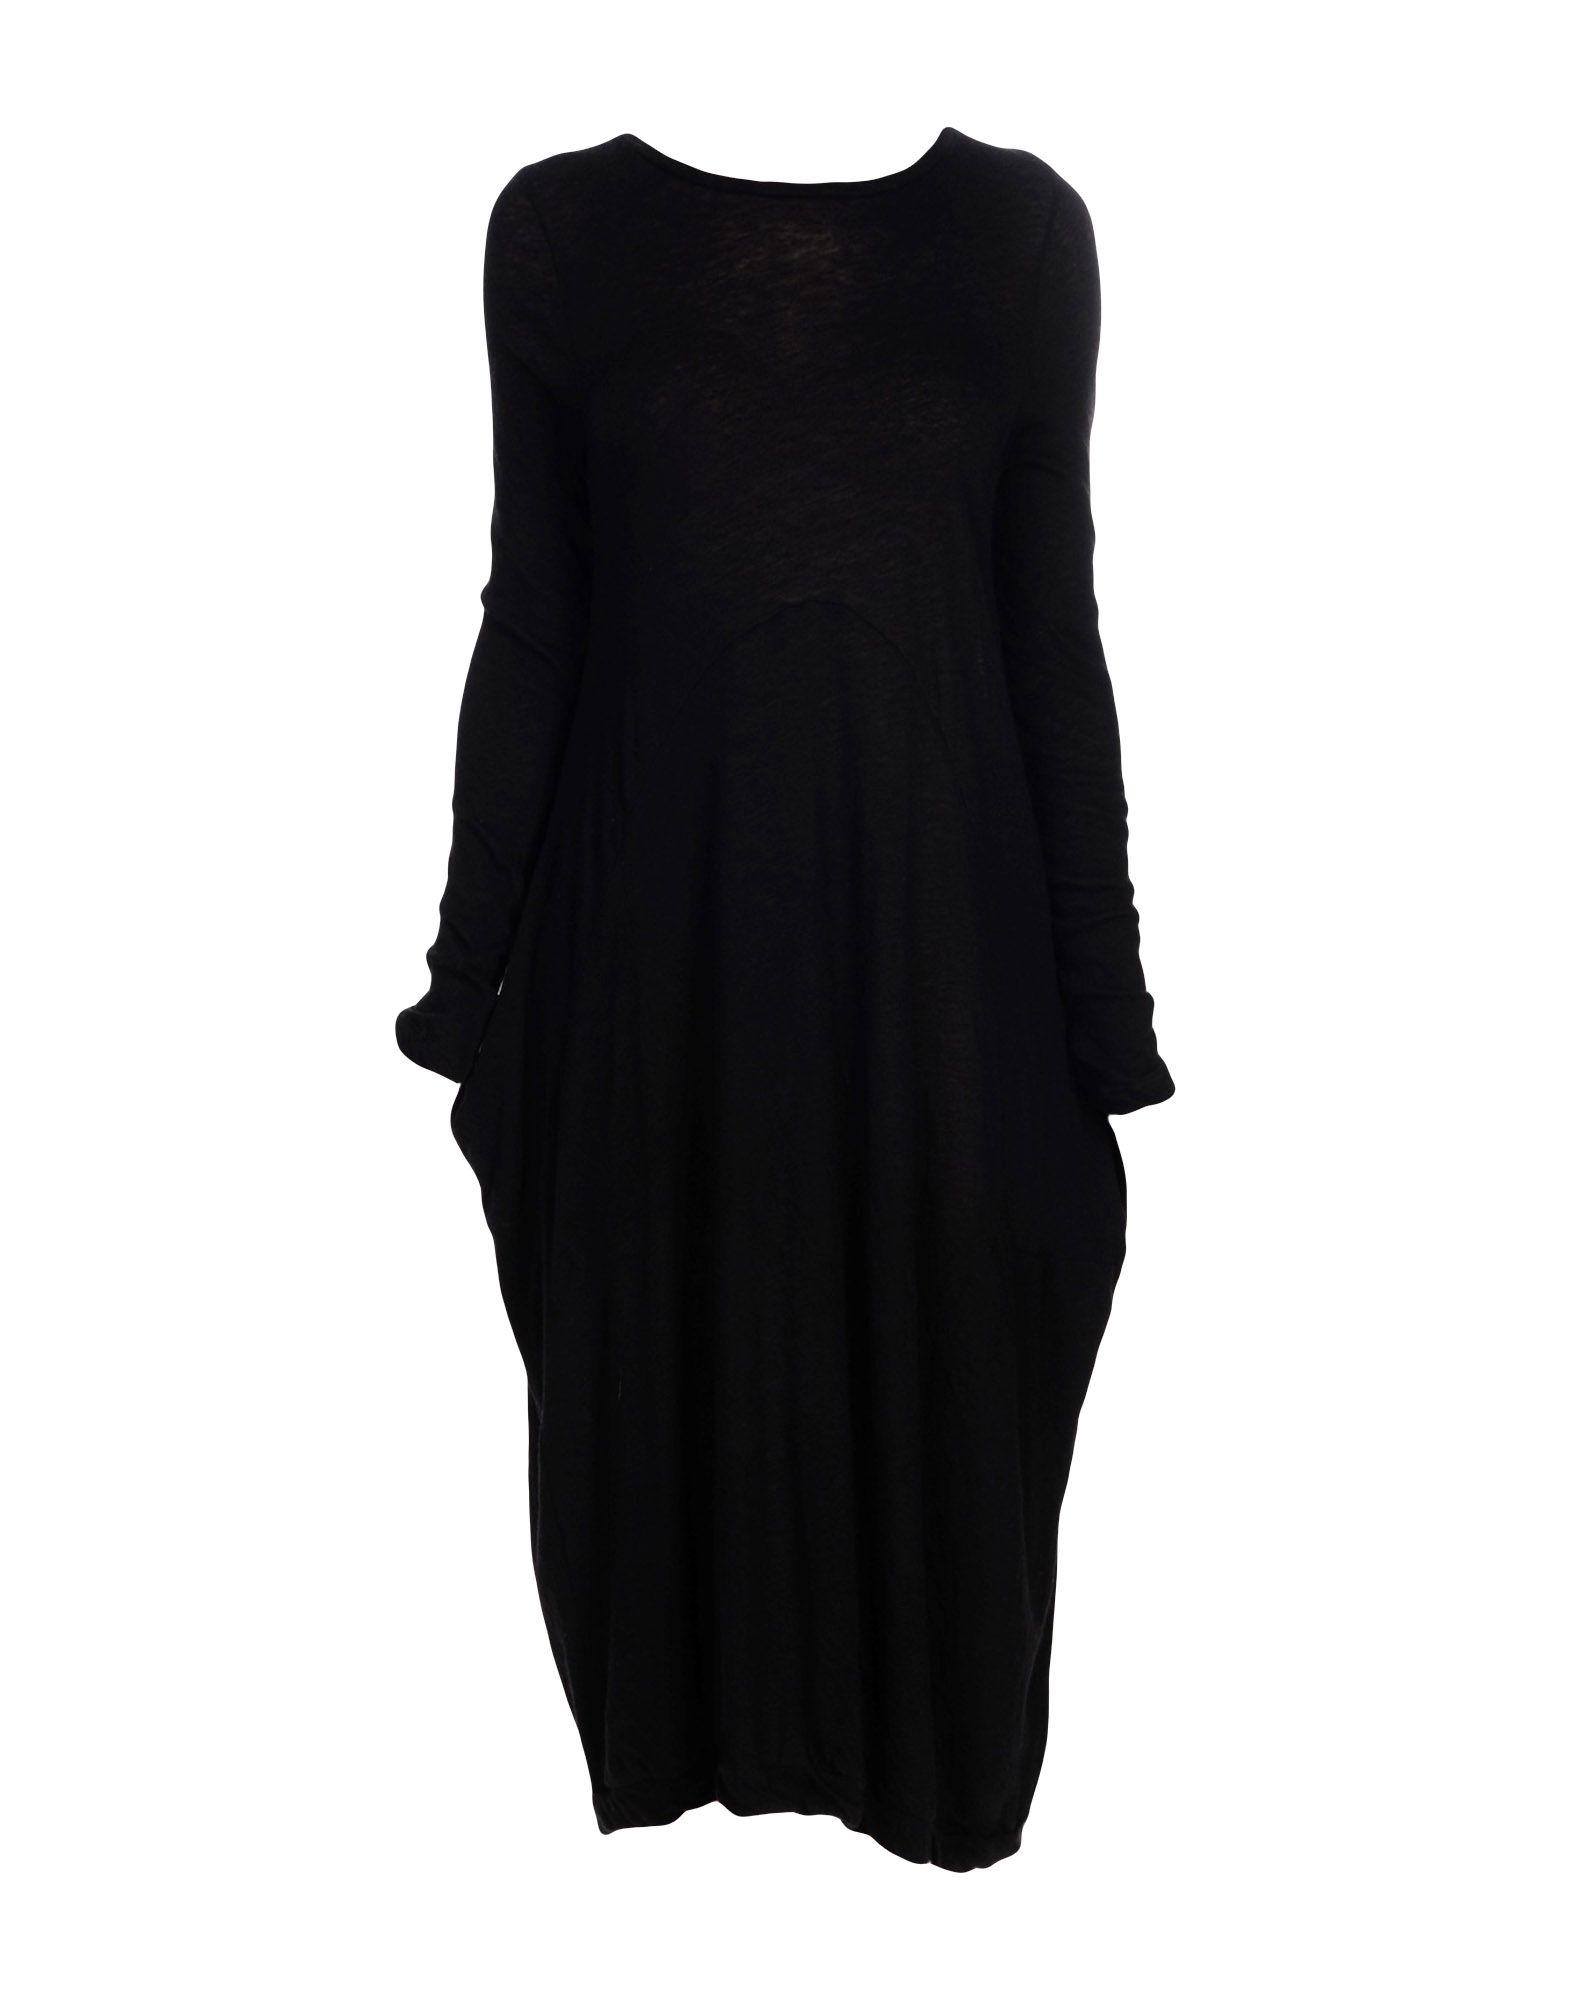 POÈME BOHÈMIEN Платье длиной 3/4 tenax платье длиной 3 4